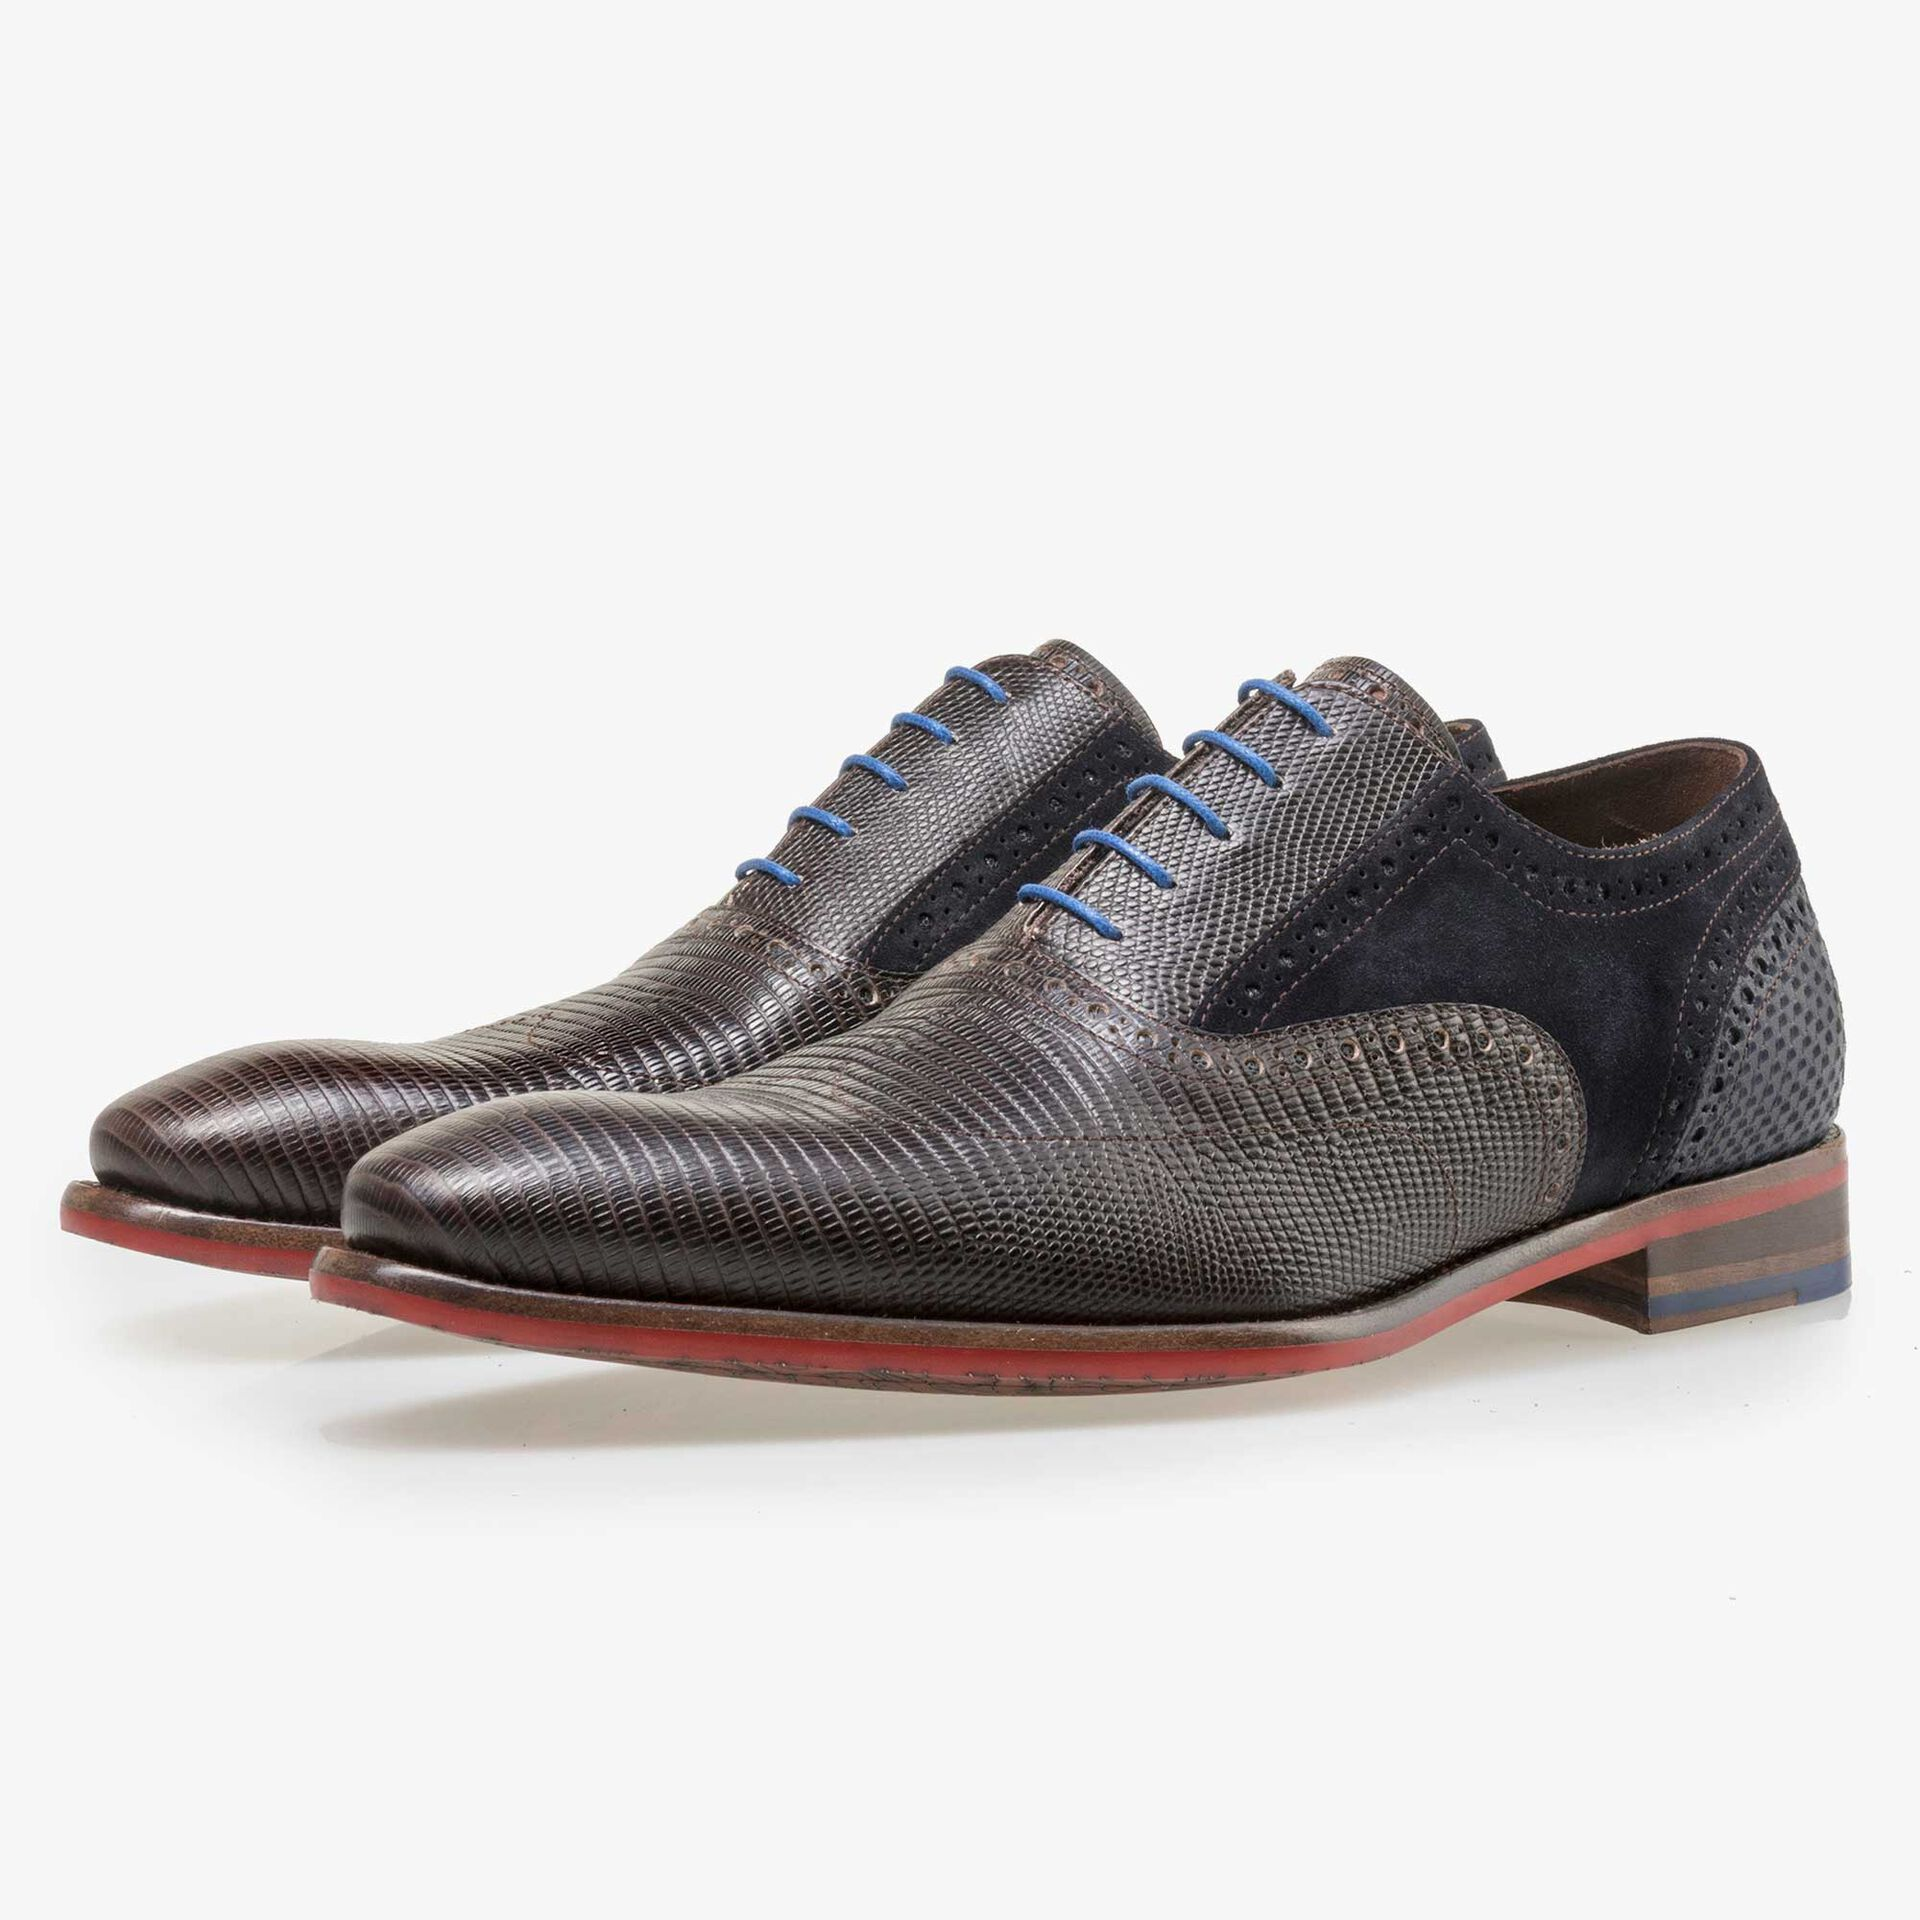 Floris van Bommel men's dark brown leather lace shoe